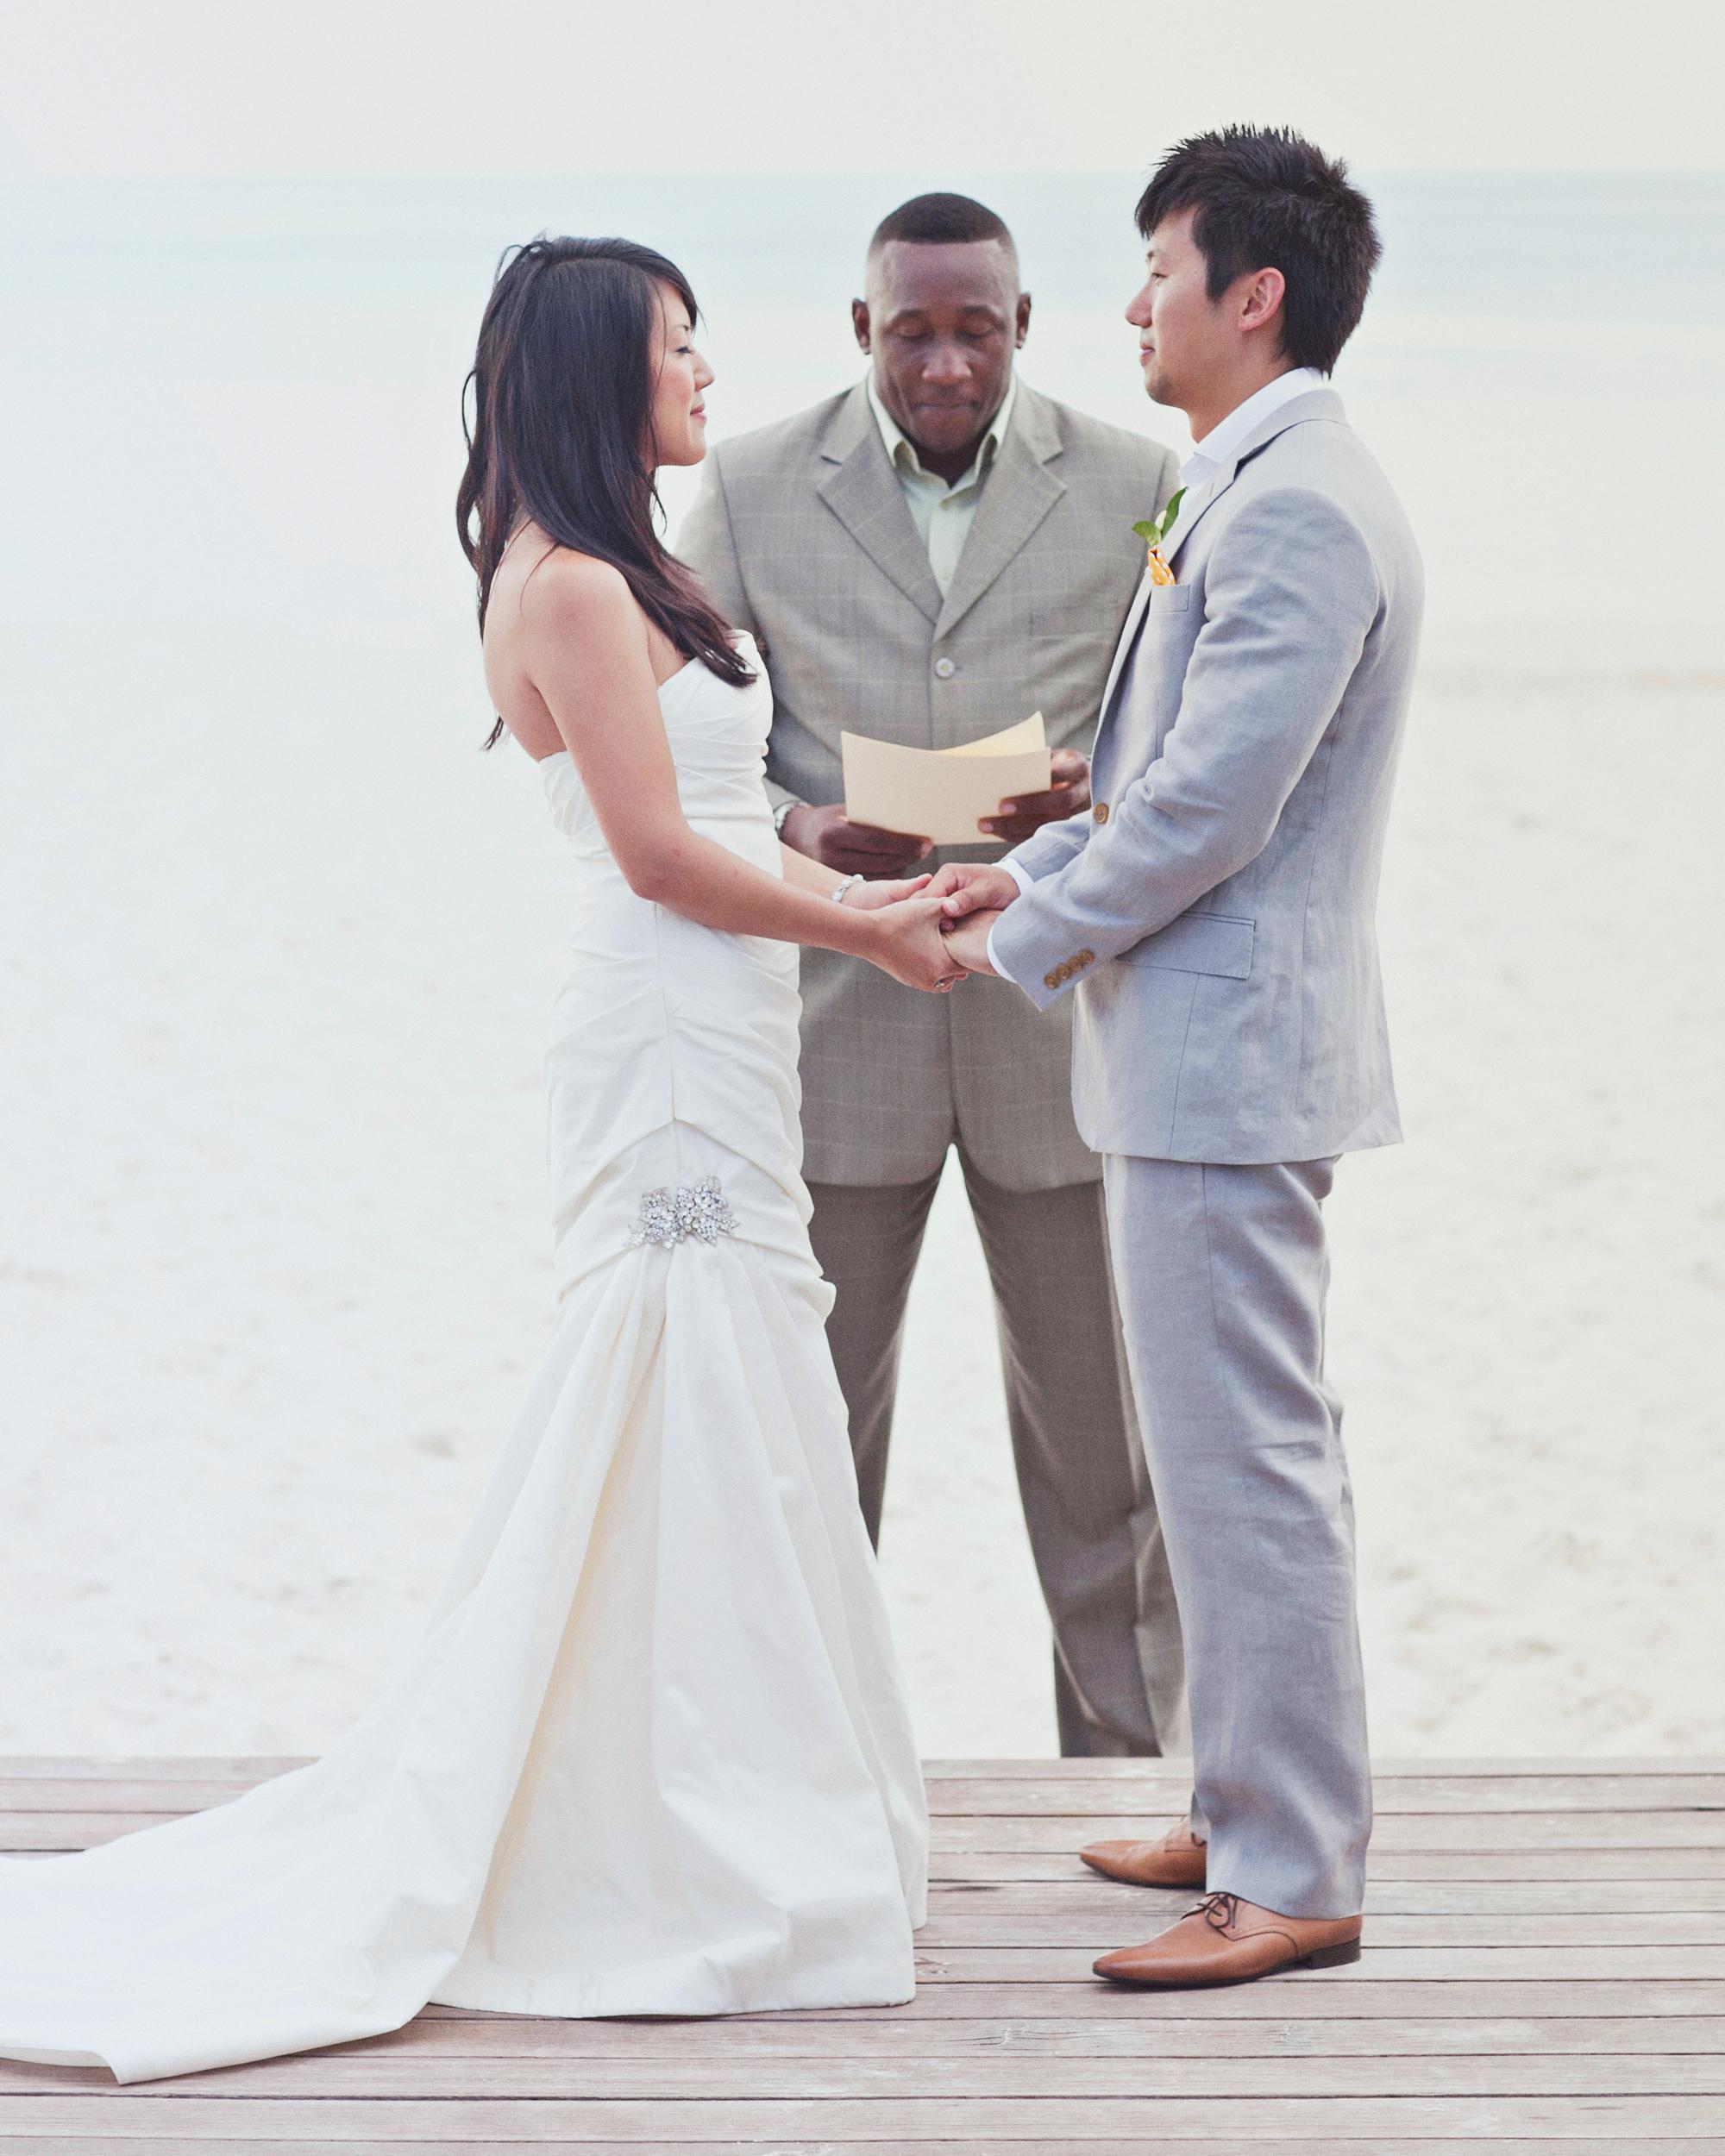 real-weddings-jessica-bobby-0811-371.jpg